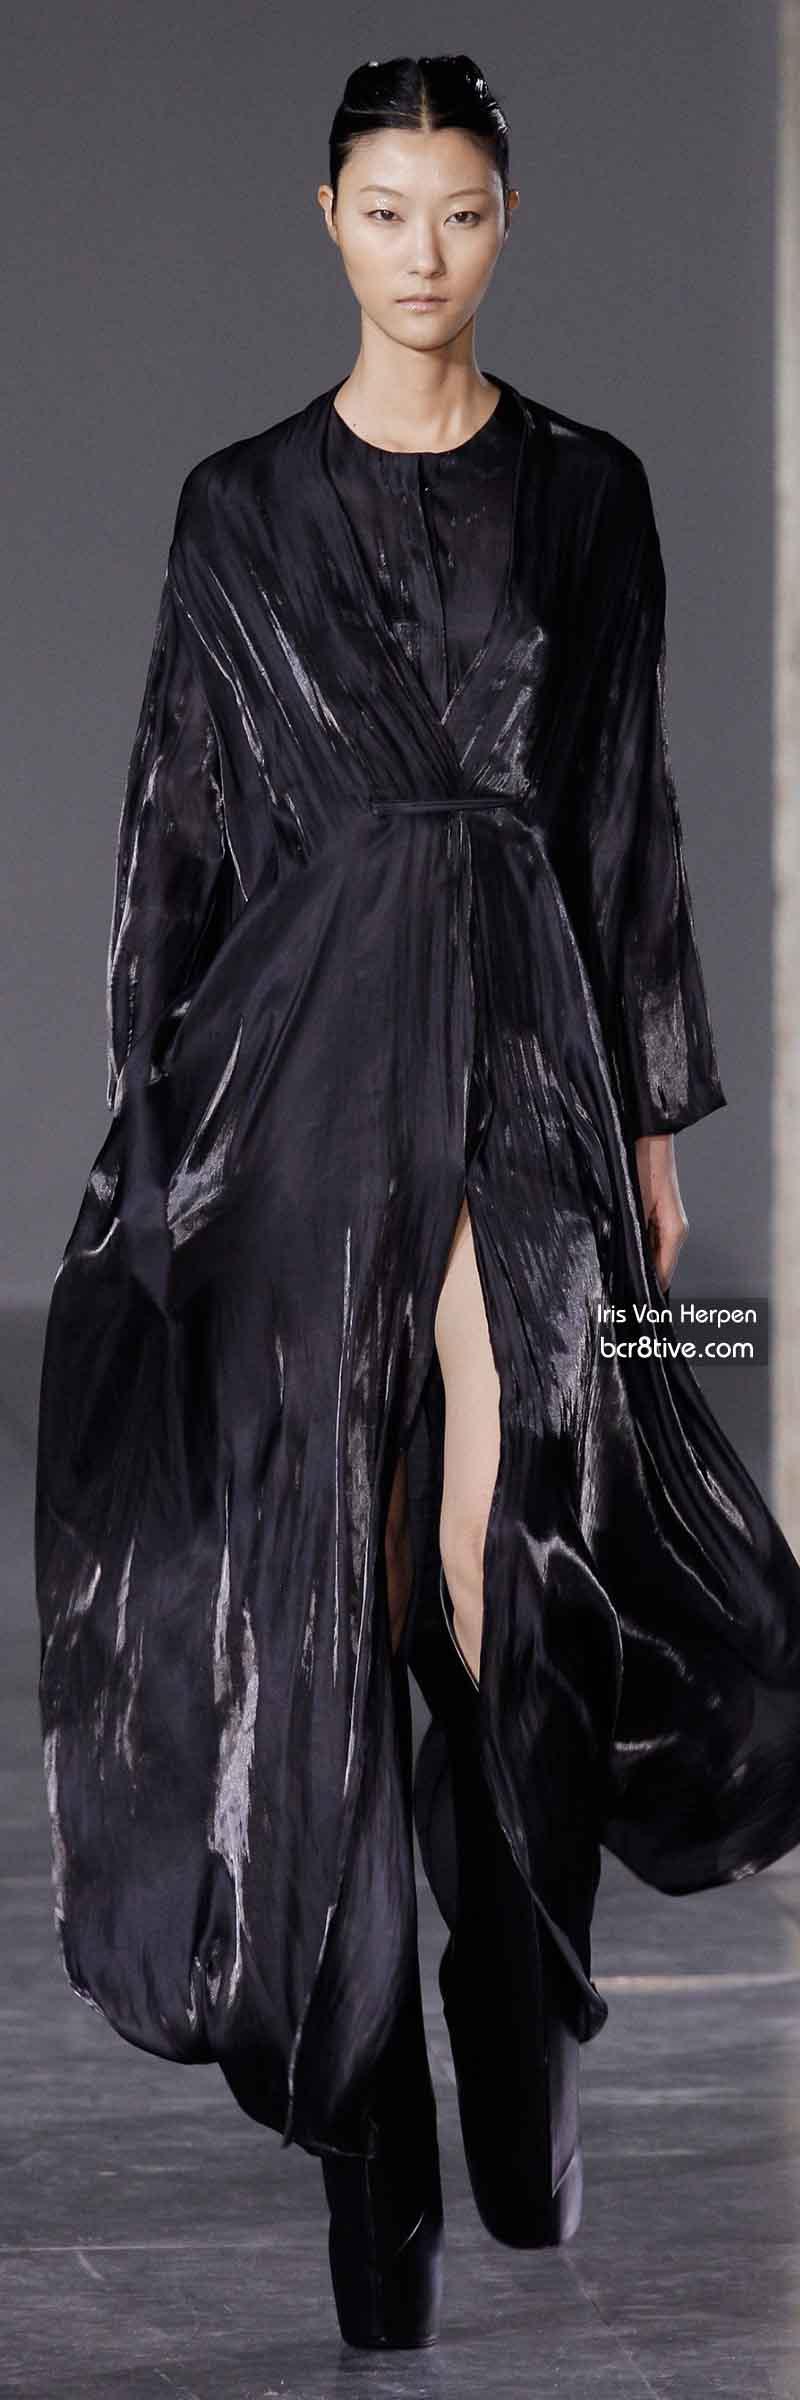 Iris Van Herpen FW 2014 #ParisFashionWeek